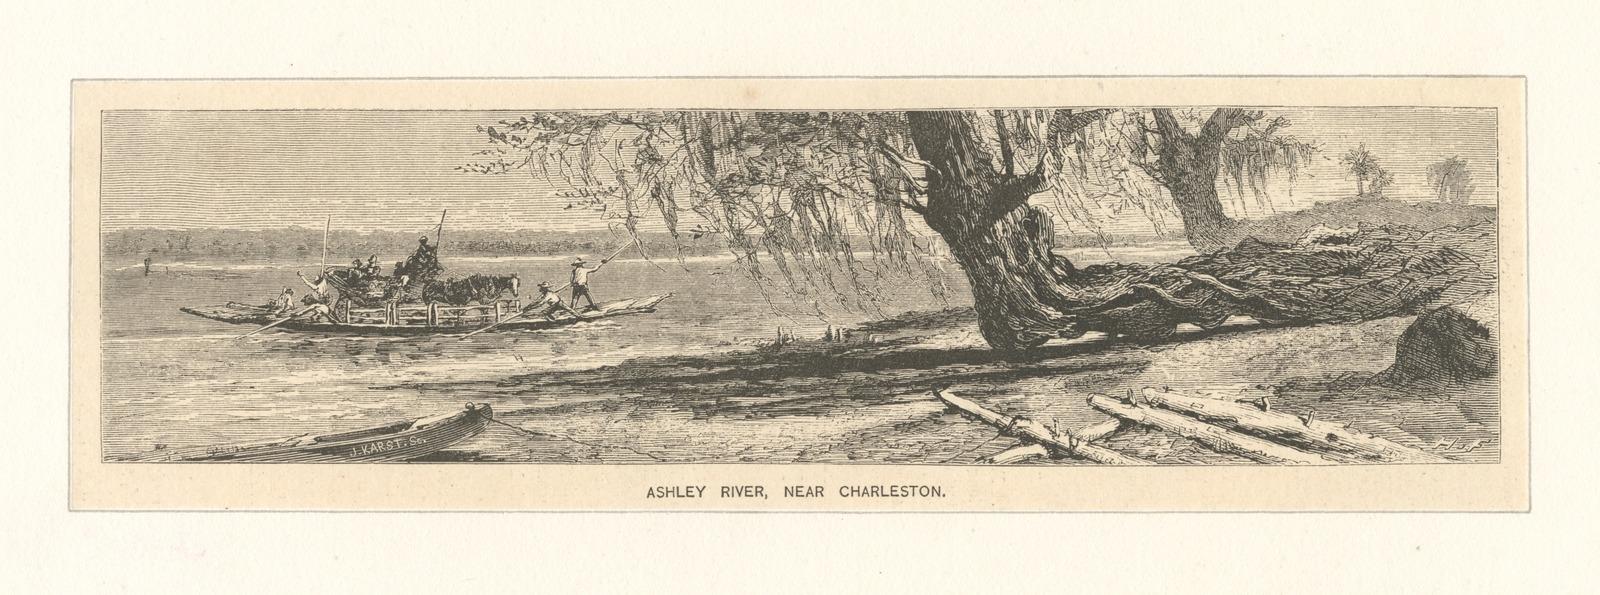 Ashley River, near Charleston